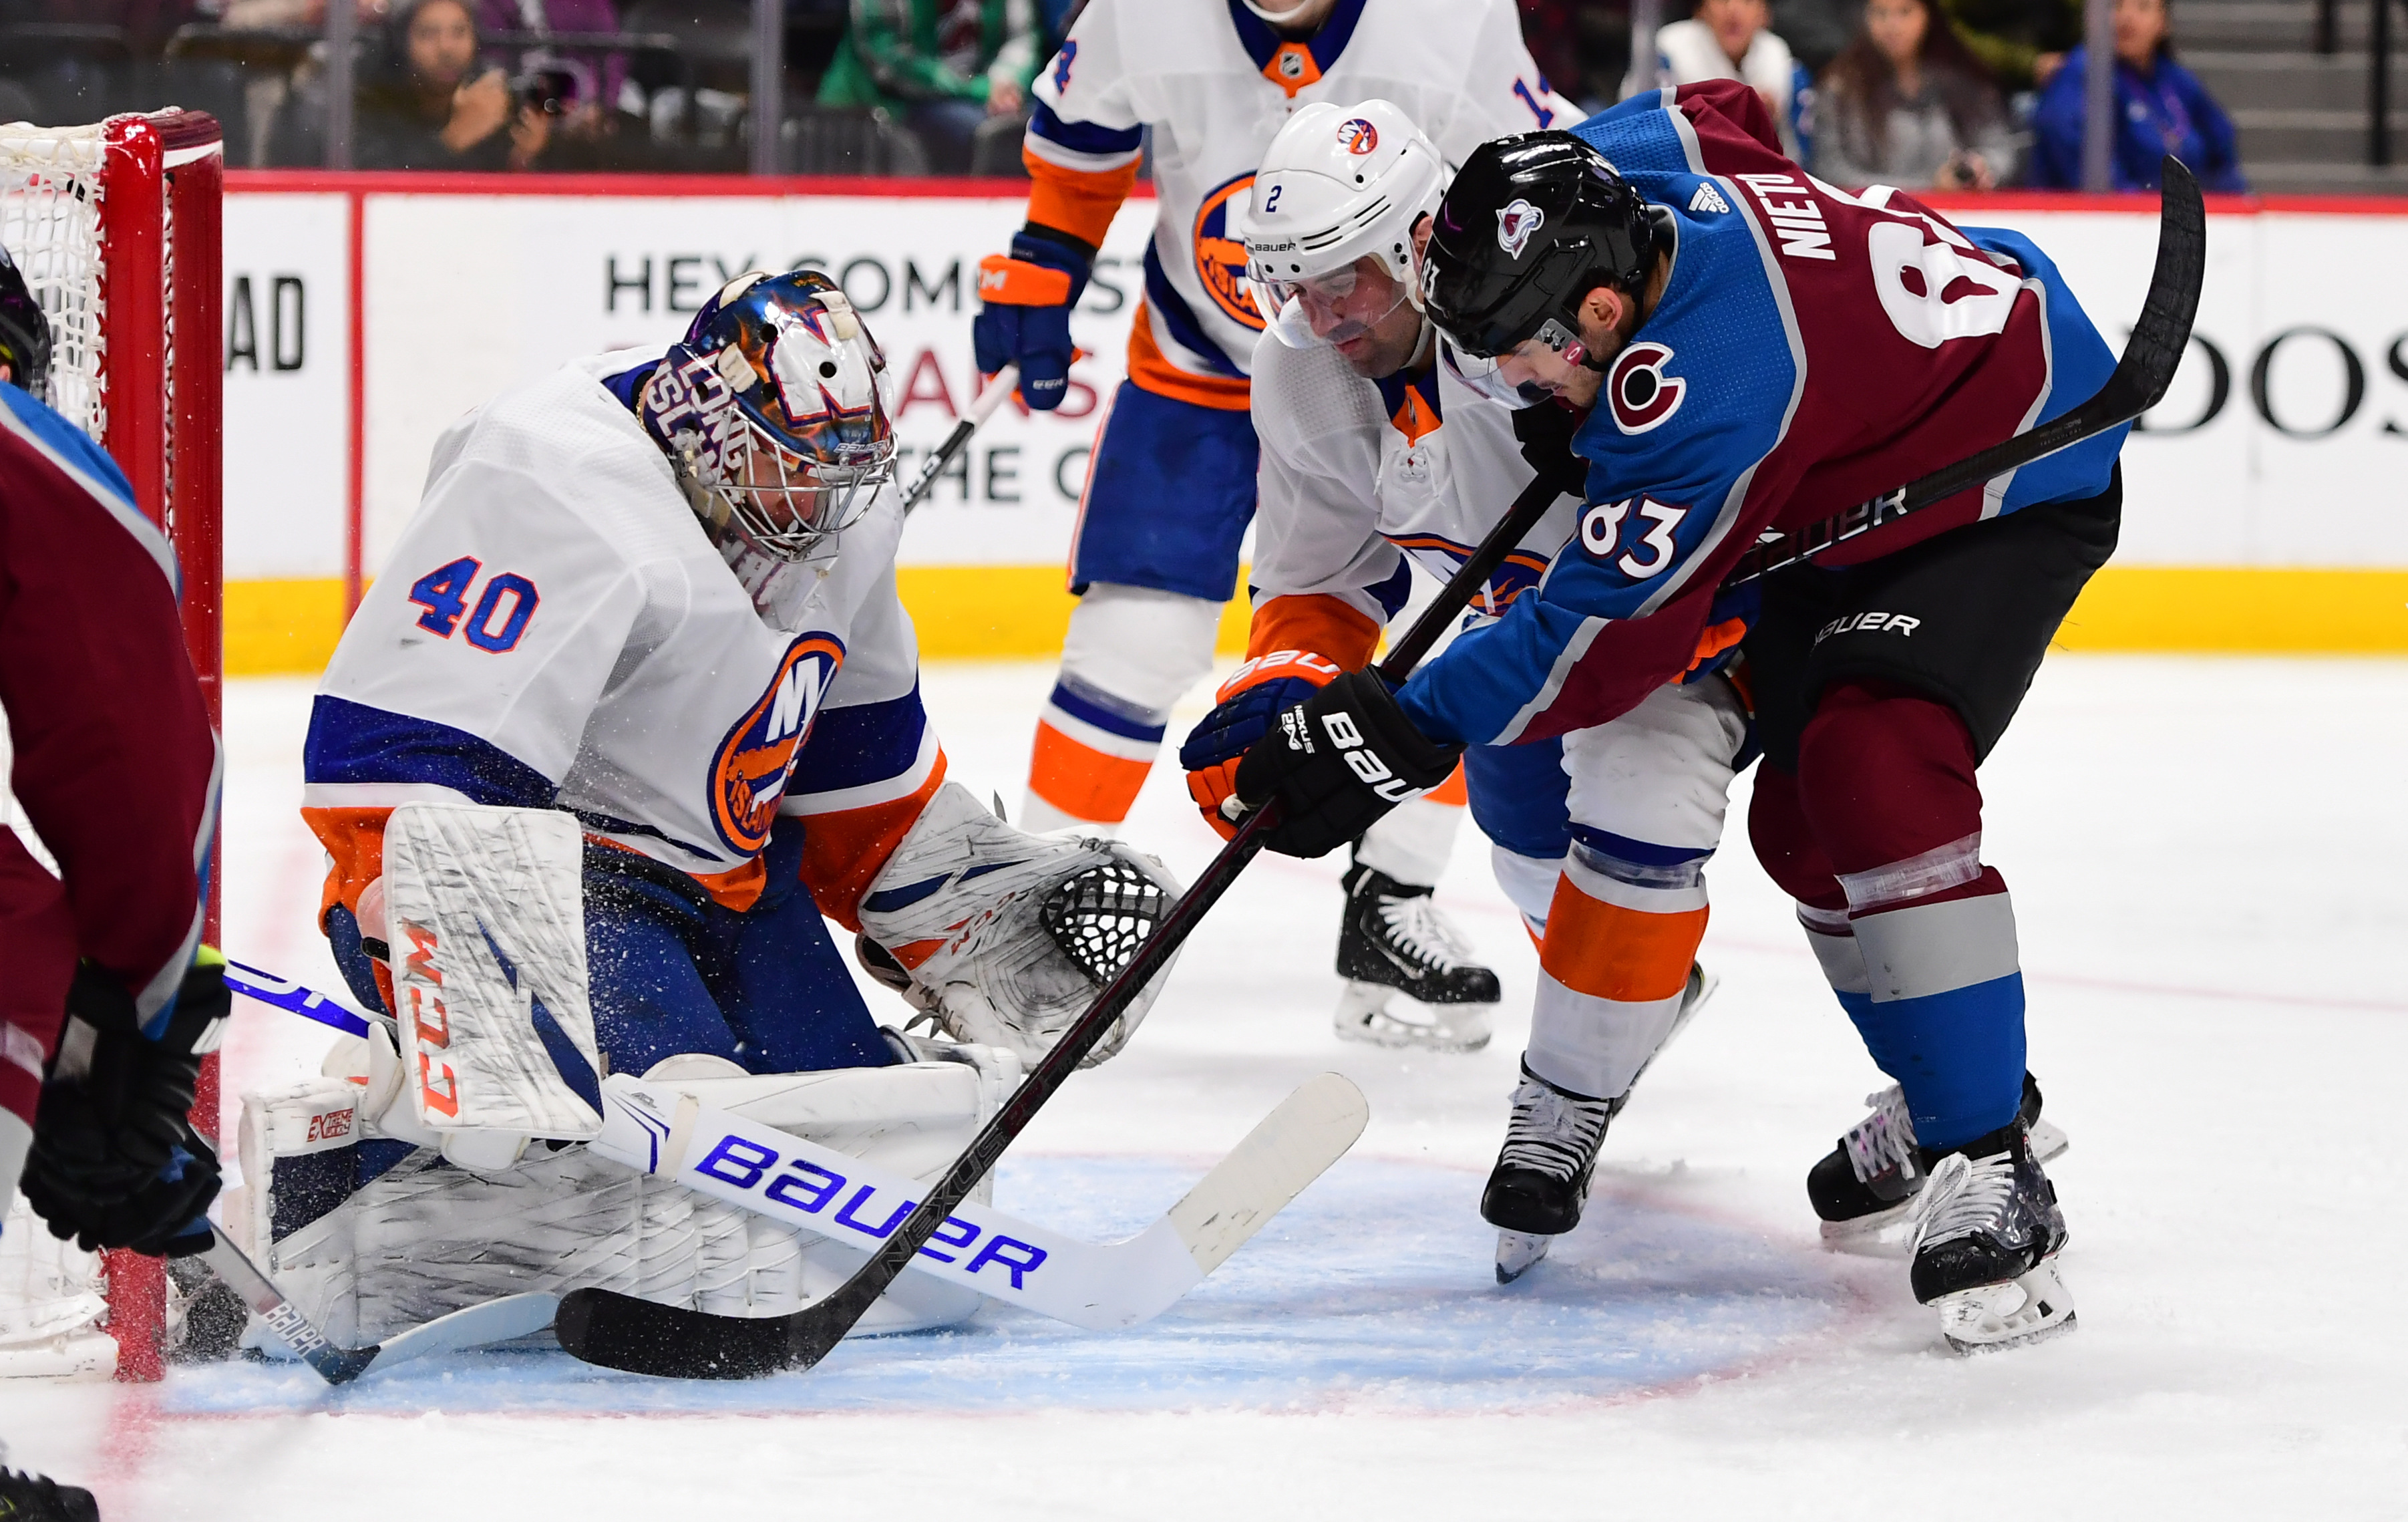 Feb 19, 2020; Denver, Colorado, USA; Colorado Avalanche left wing Matt Nieto (83) attempts to score past New York Islanders goaltender Semyon Varlamov (40) and defenseman Nick Leddy (2) in the second period at the Pepsi Center. Mandatory Credit: Ron Chenoy-USA TODAY Sports